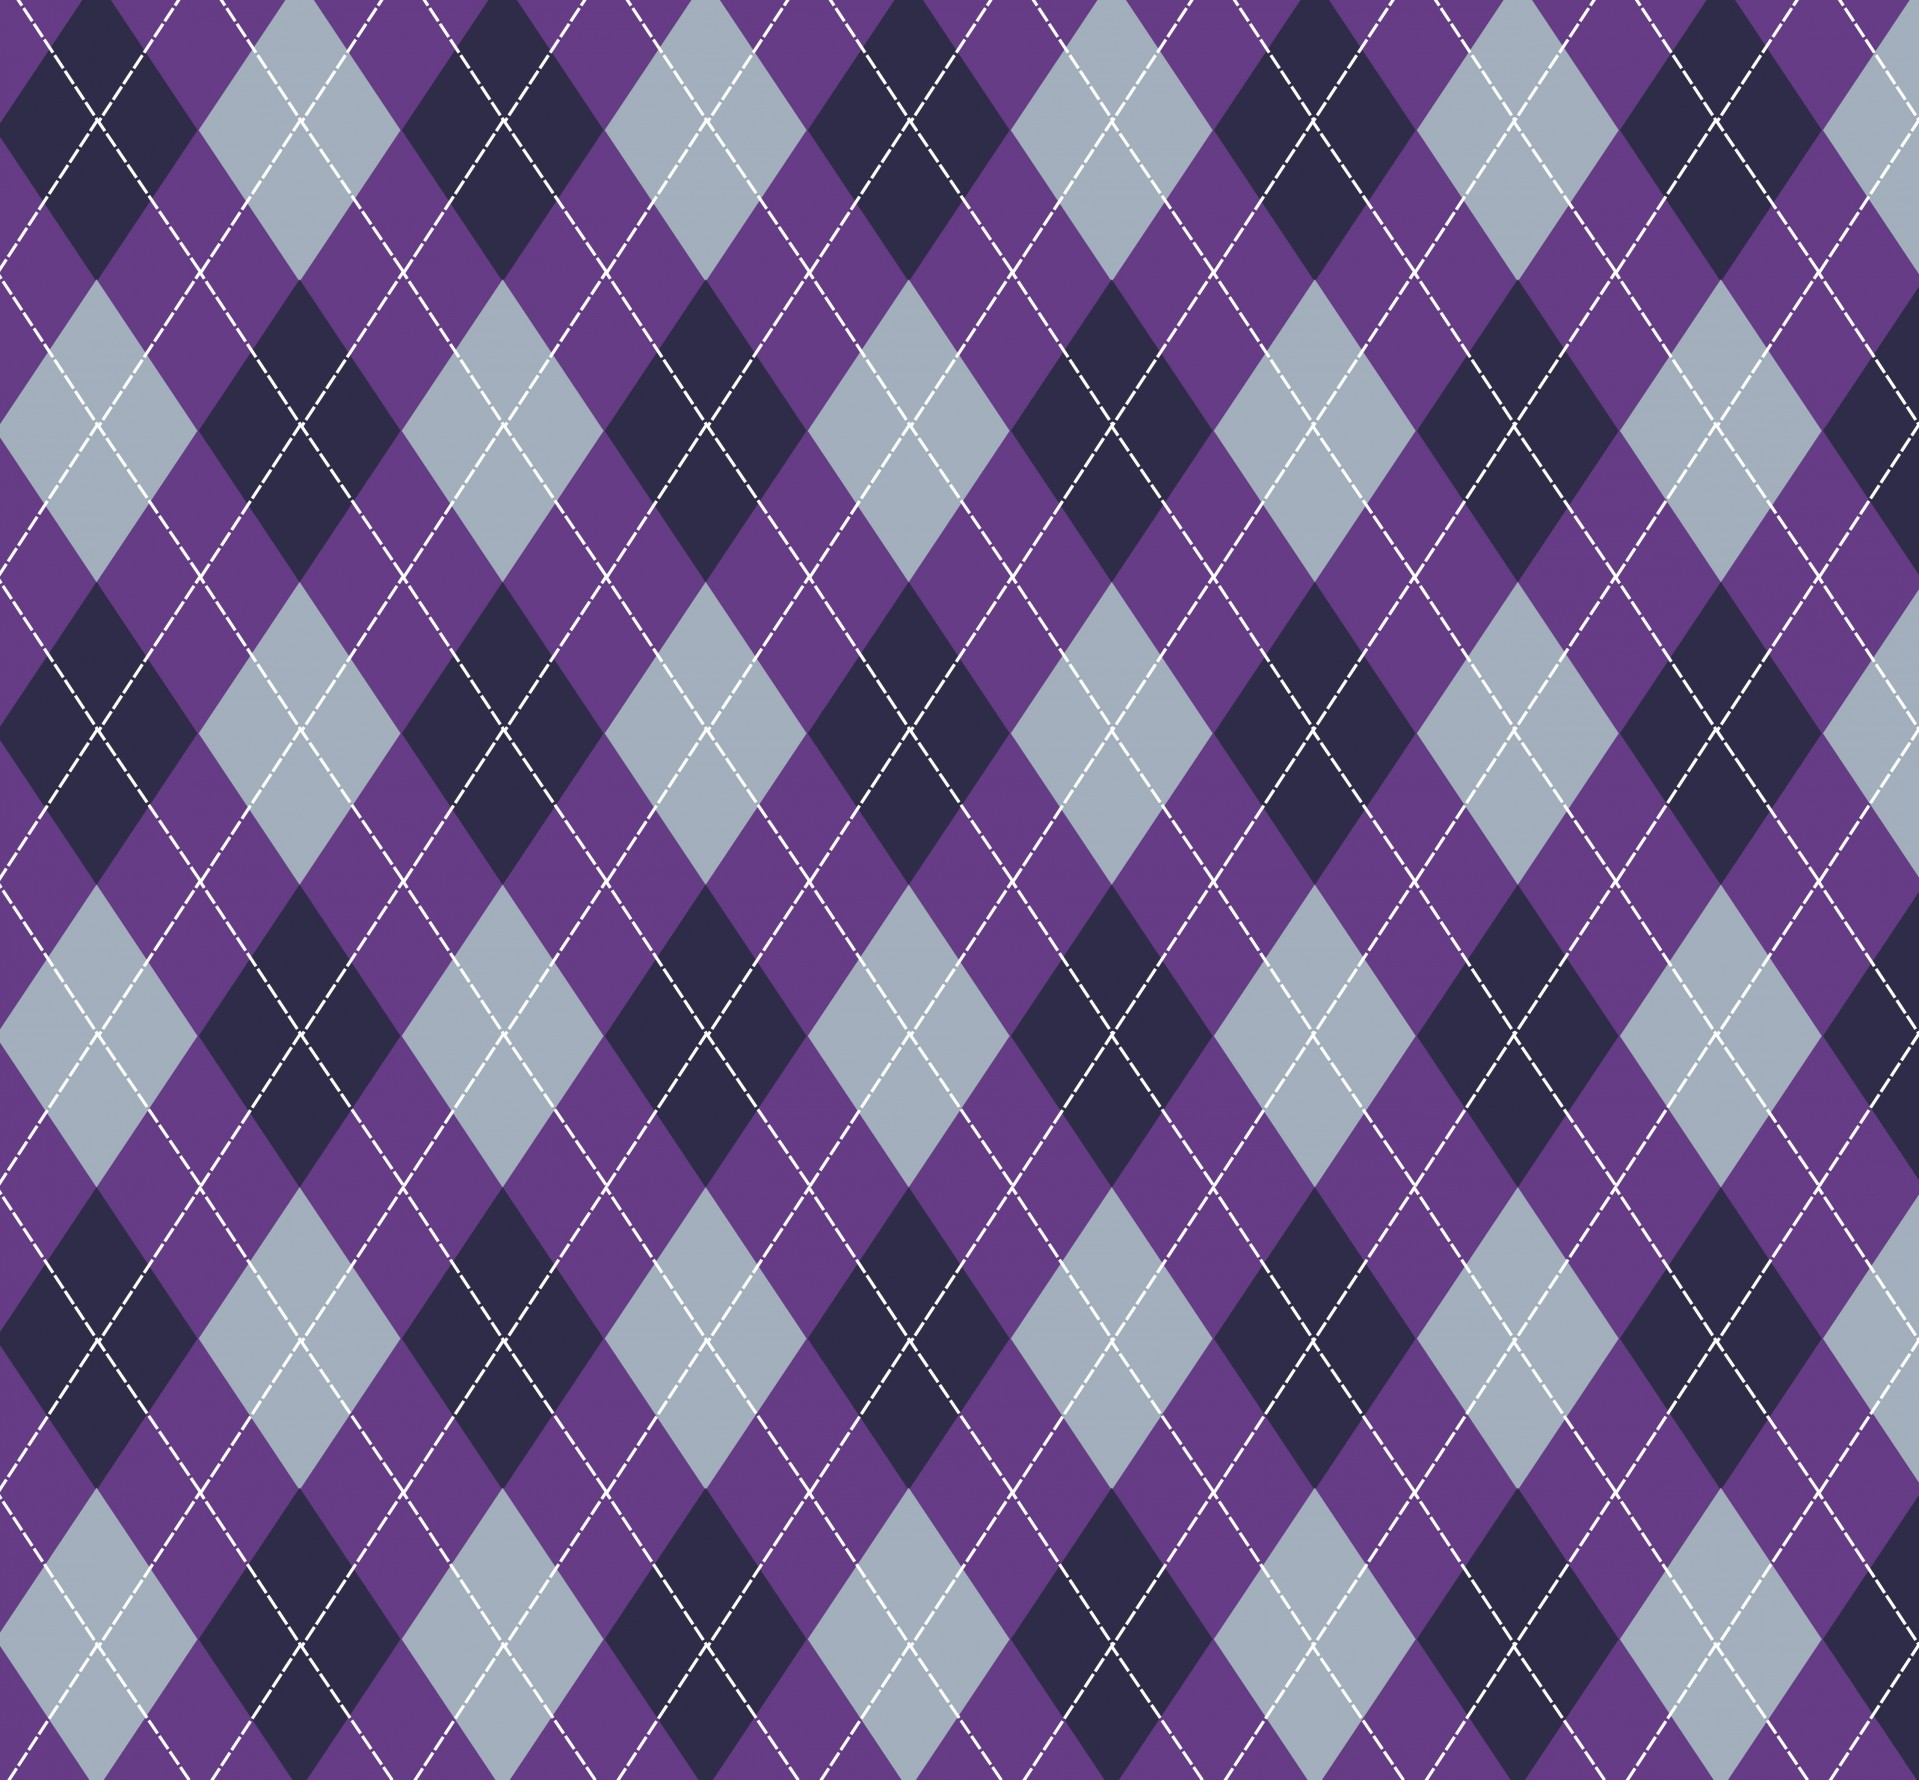 Black Plaid Wallpaper Argyle Pattern Purple Grey Free Stock Photo Public